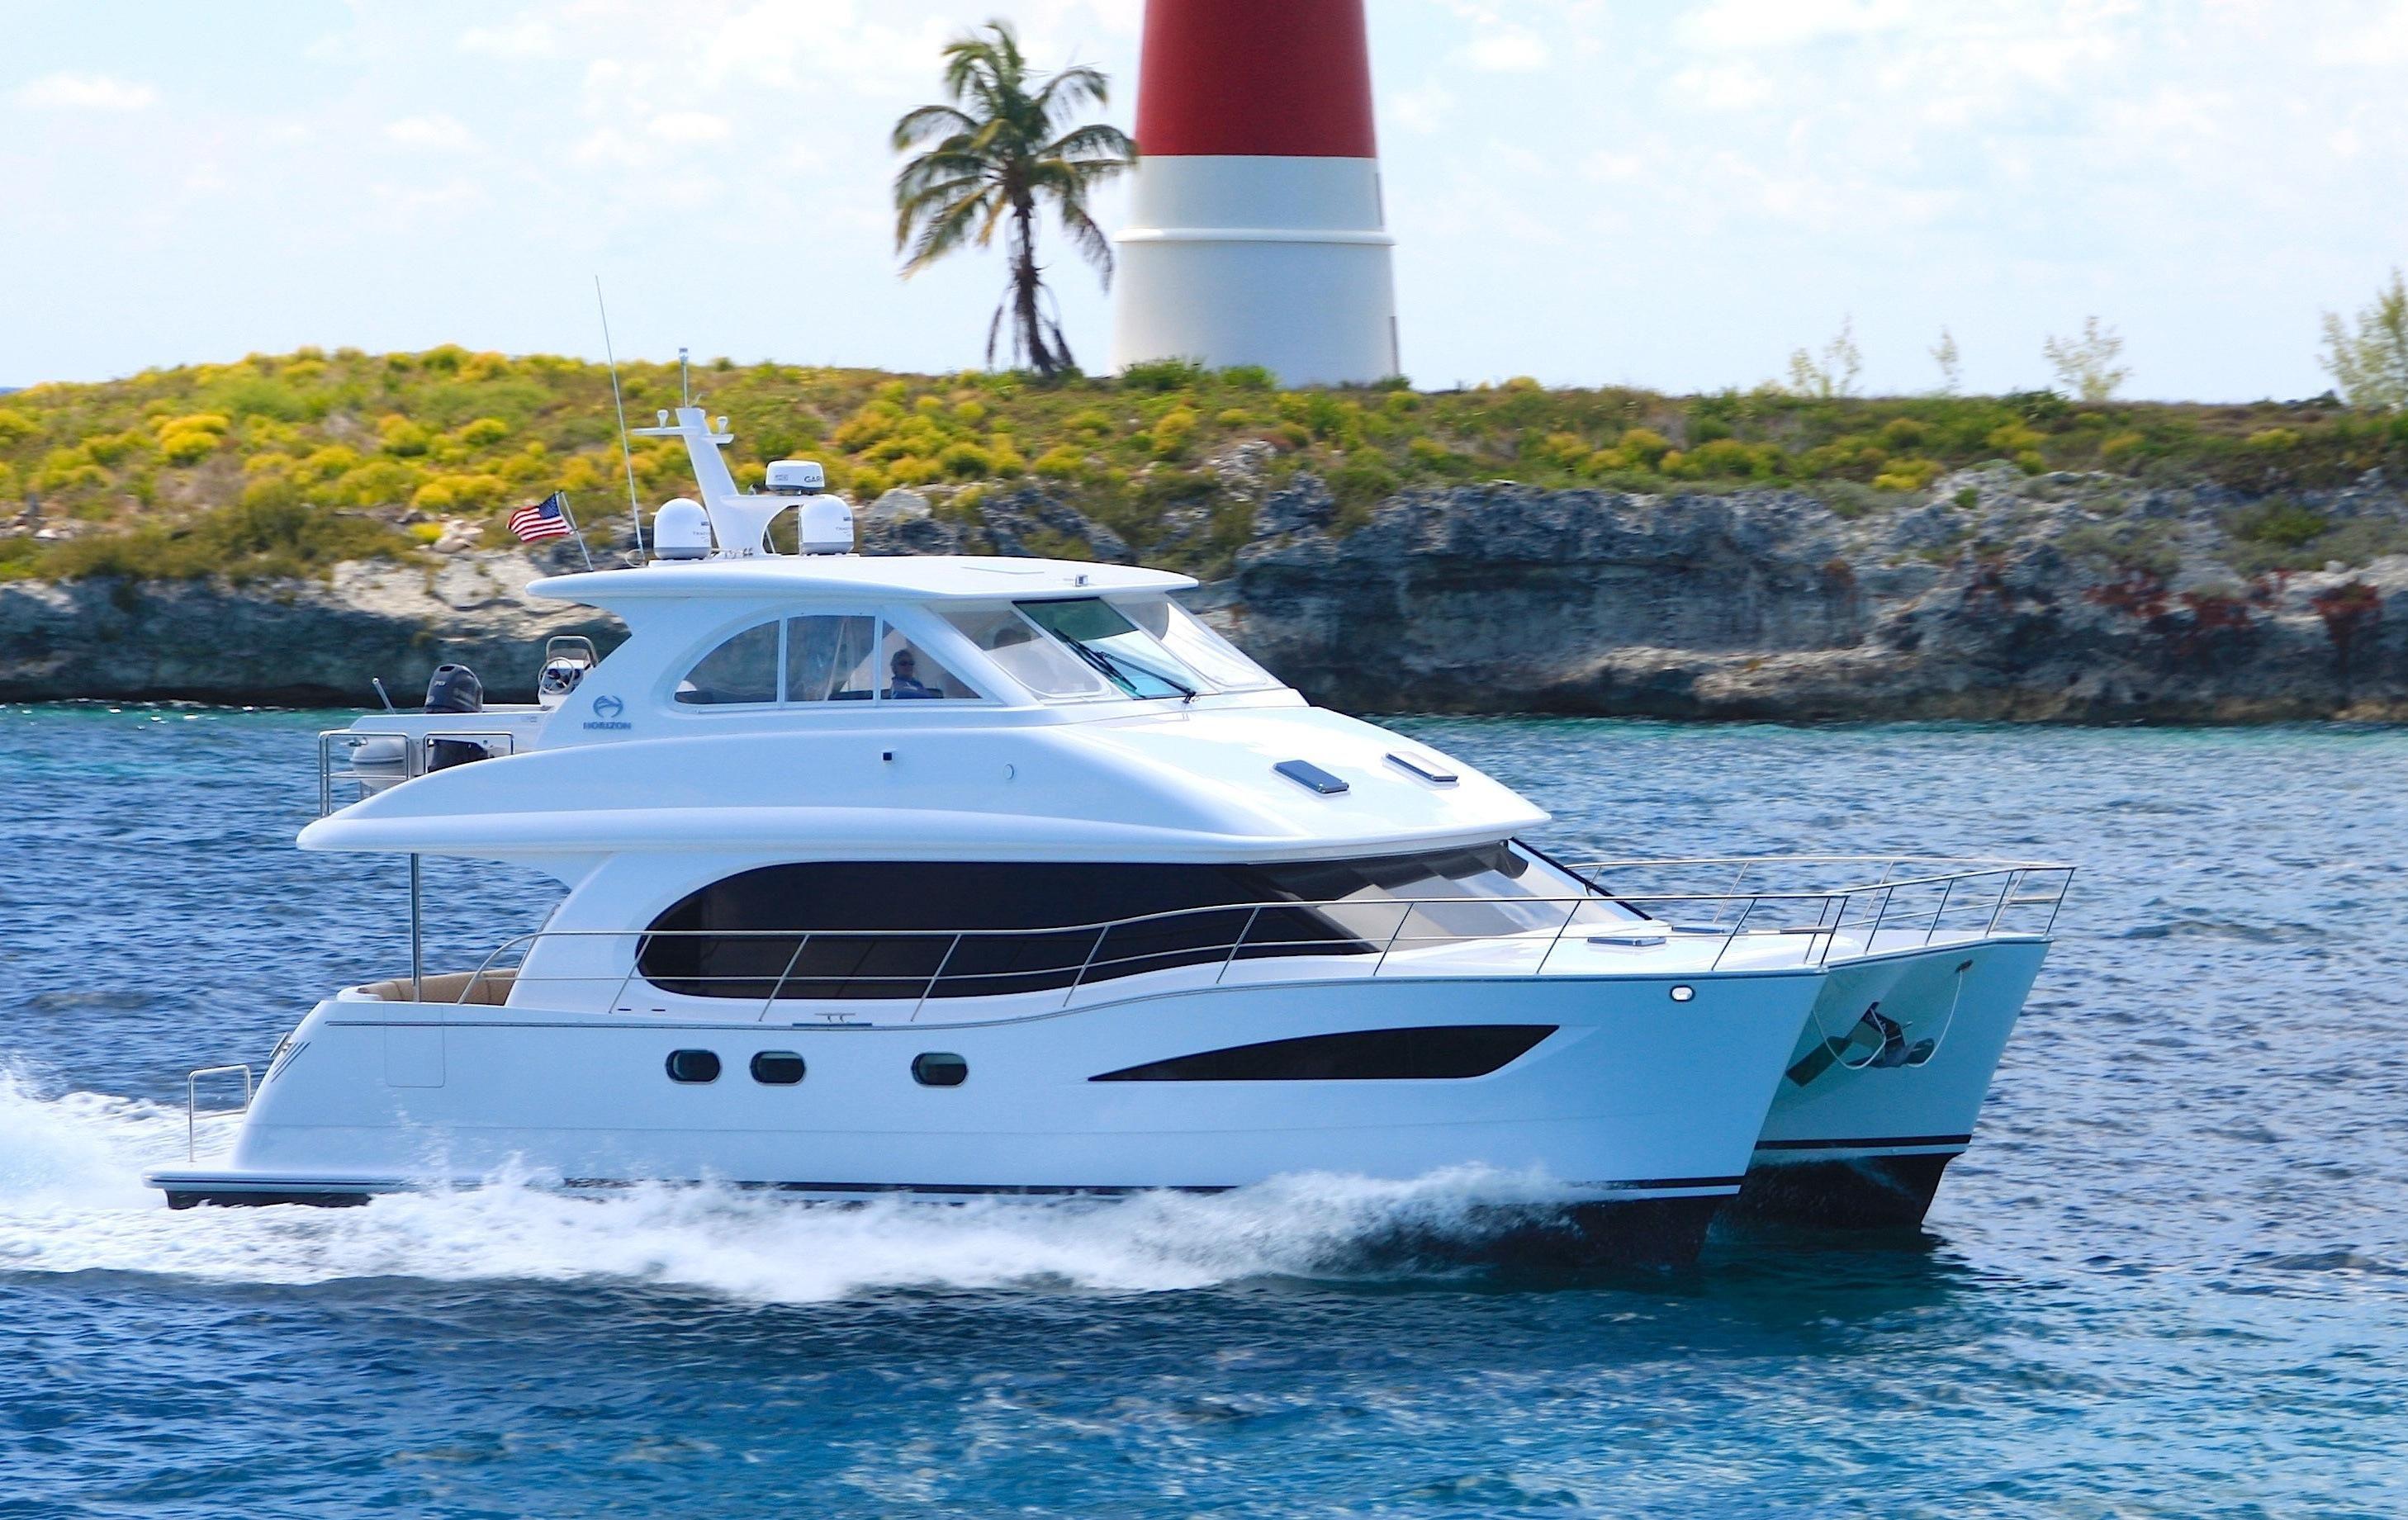 2019 Horizon PC52 Power Boat For Sale - www.yachtworld.com